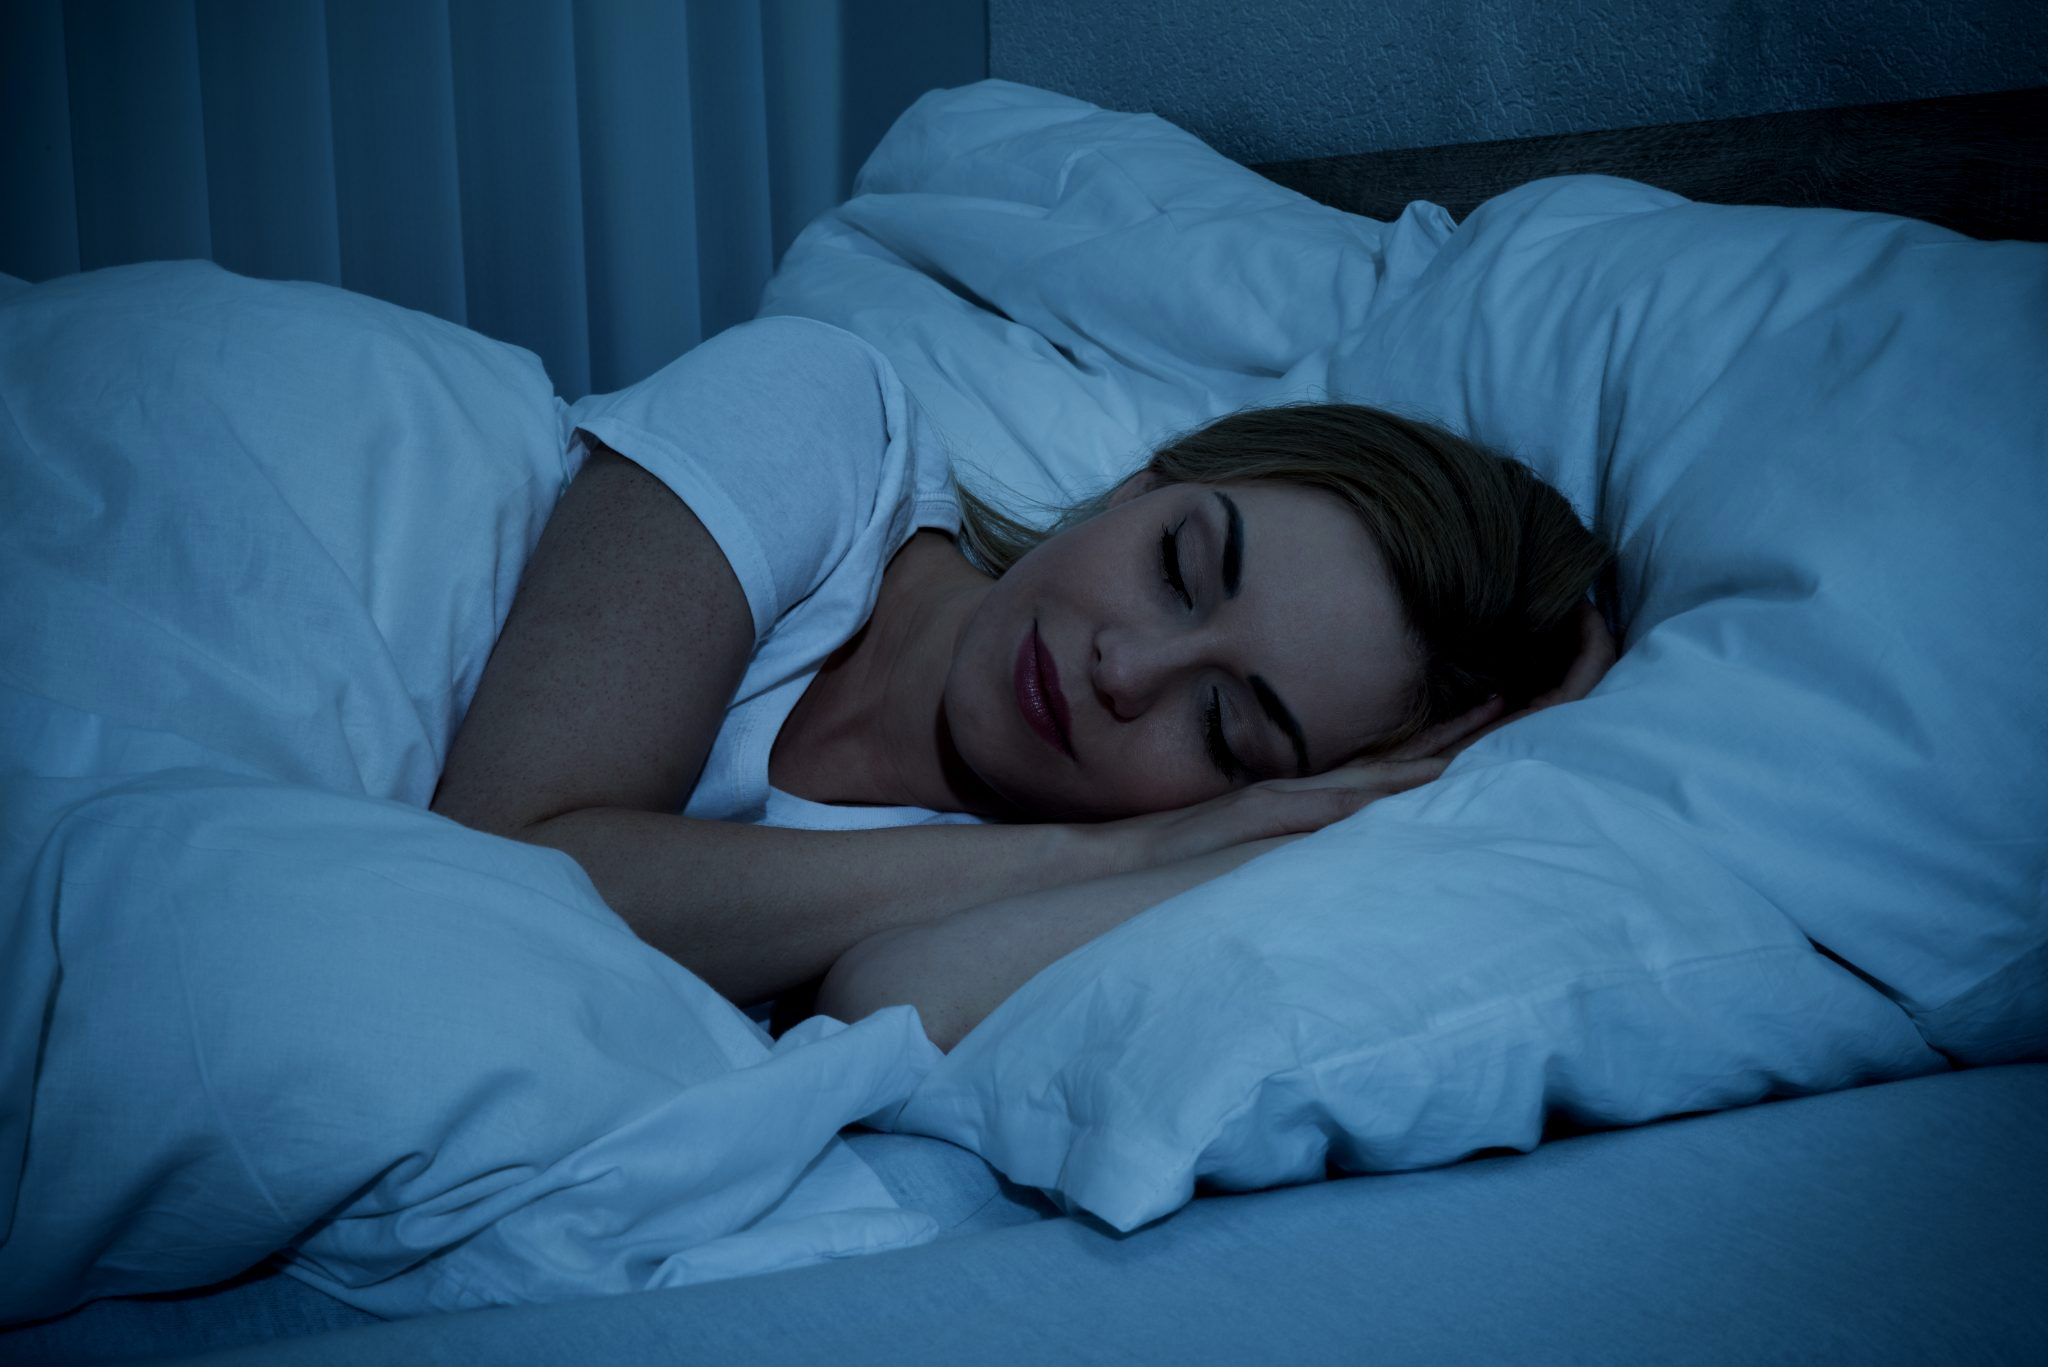 Cum sa am un somn odihnitor? Remedii simple si eficiente anti-insomnii!